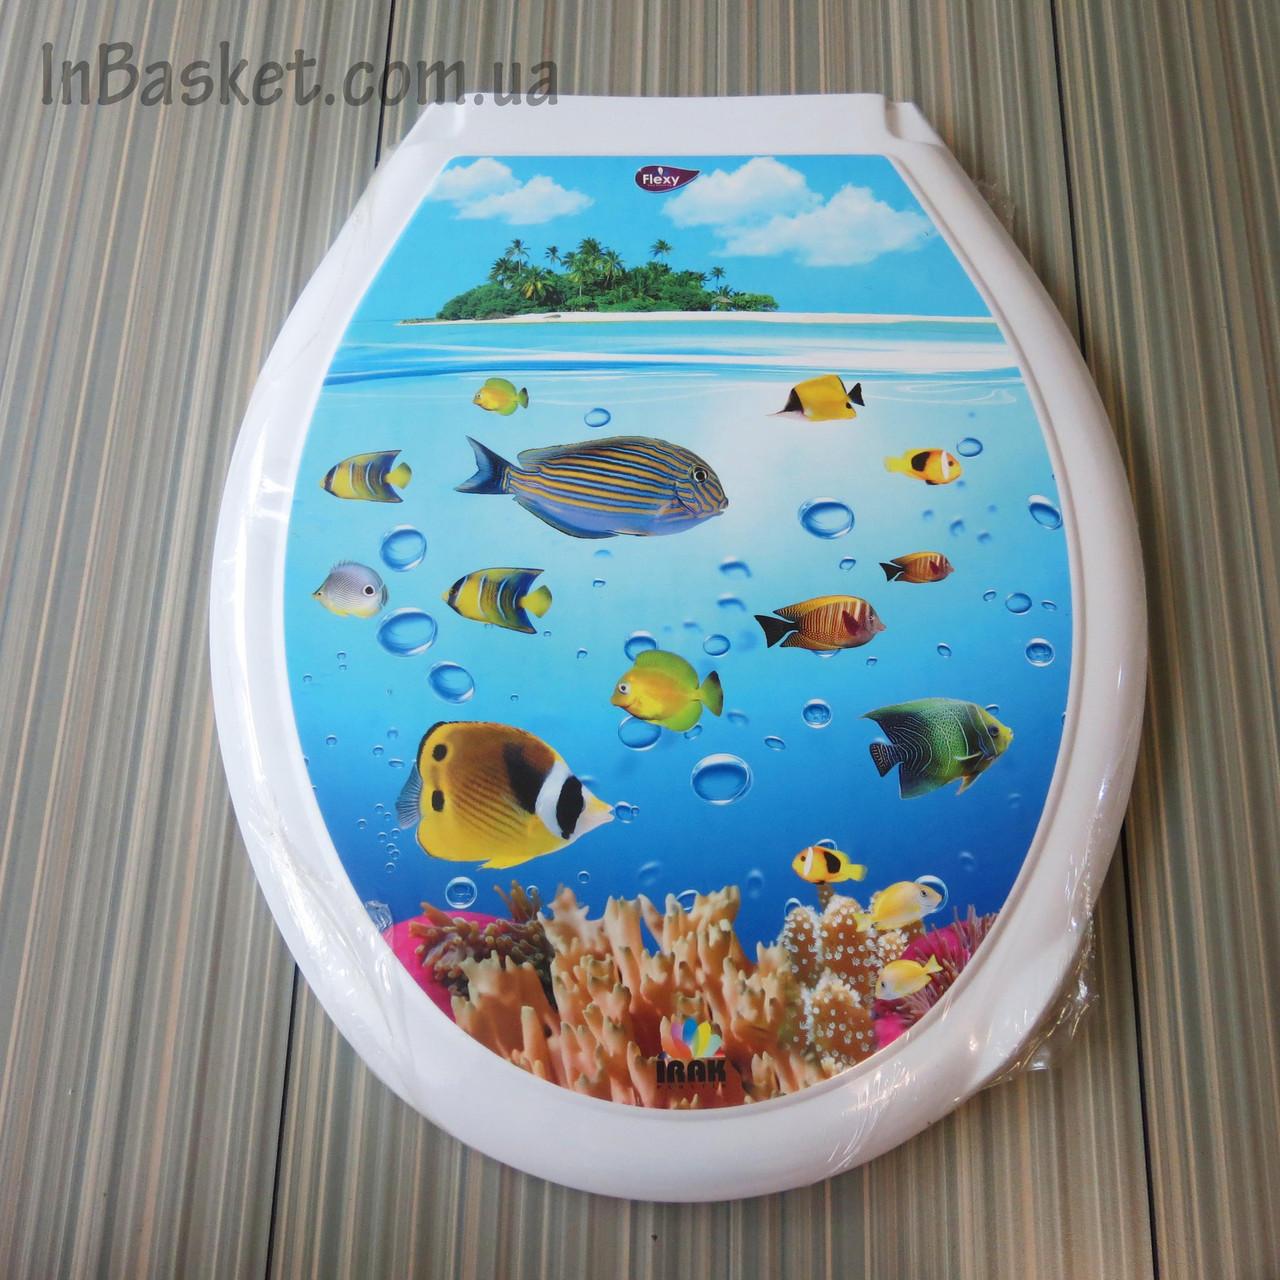 Крышка на унитаз с рисунком Океан